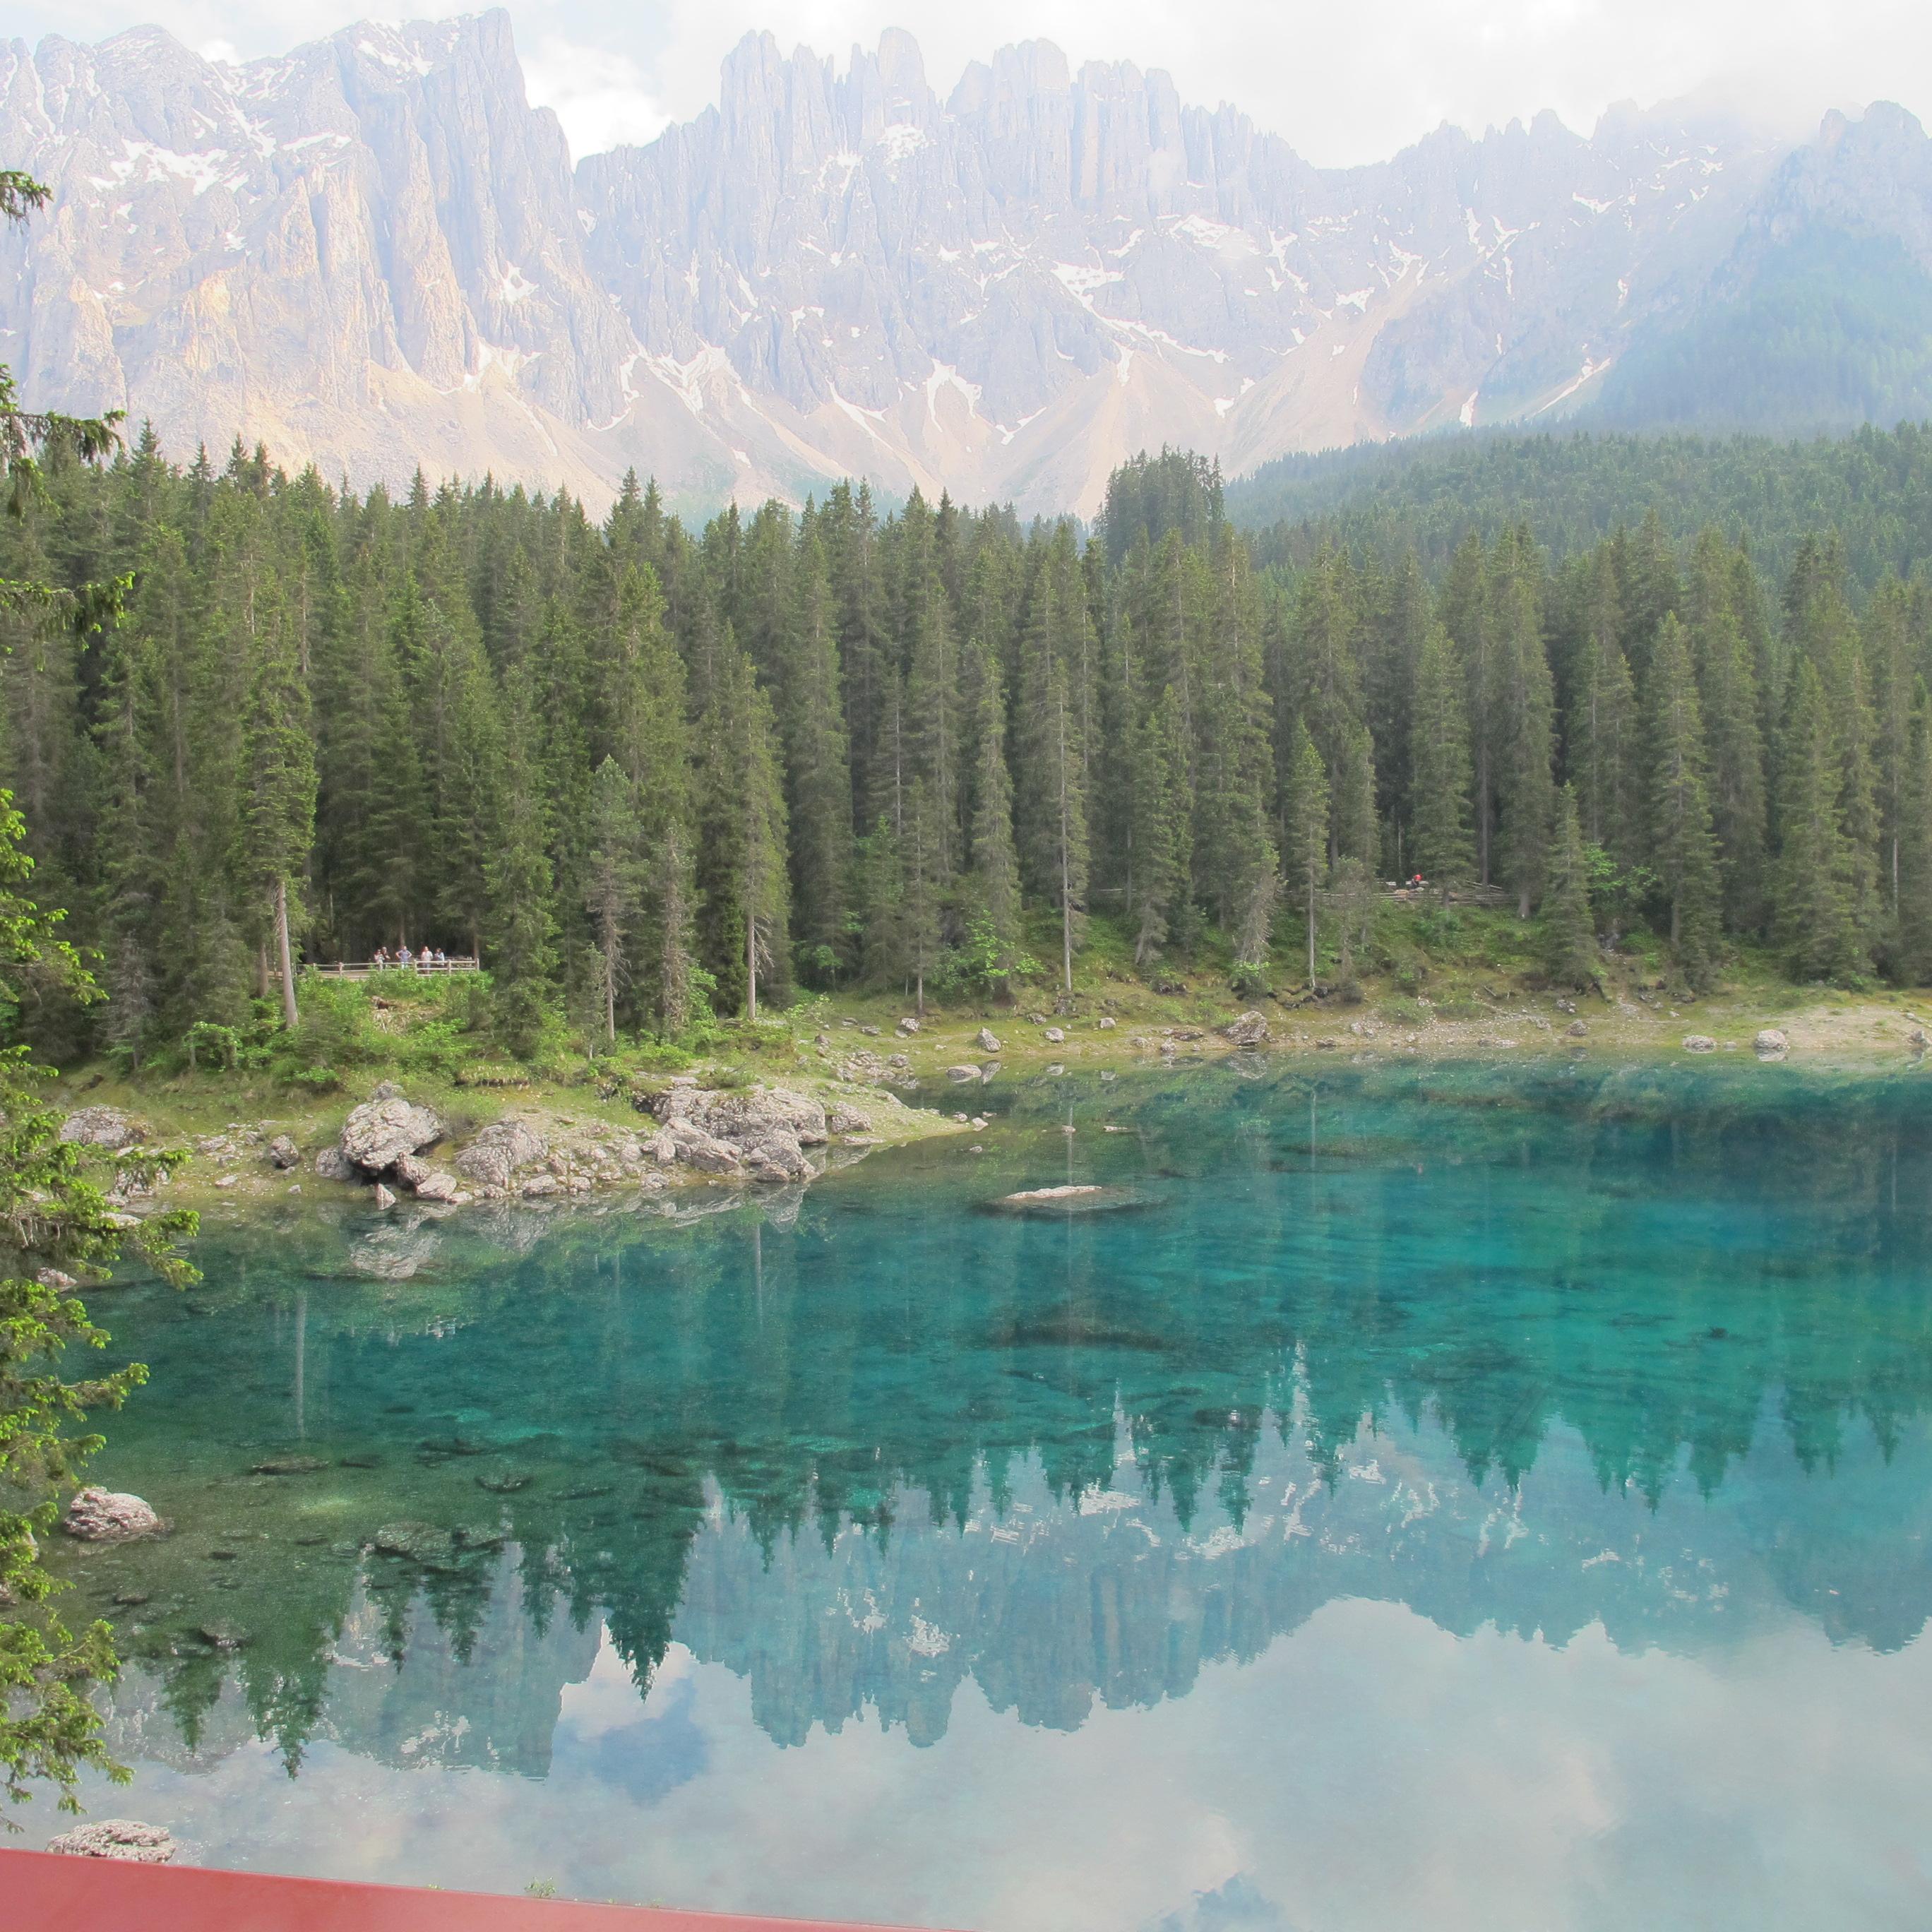 motorradurlaub-juni-2015-karrersee-013.jpg